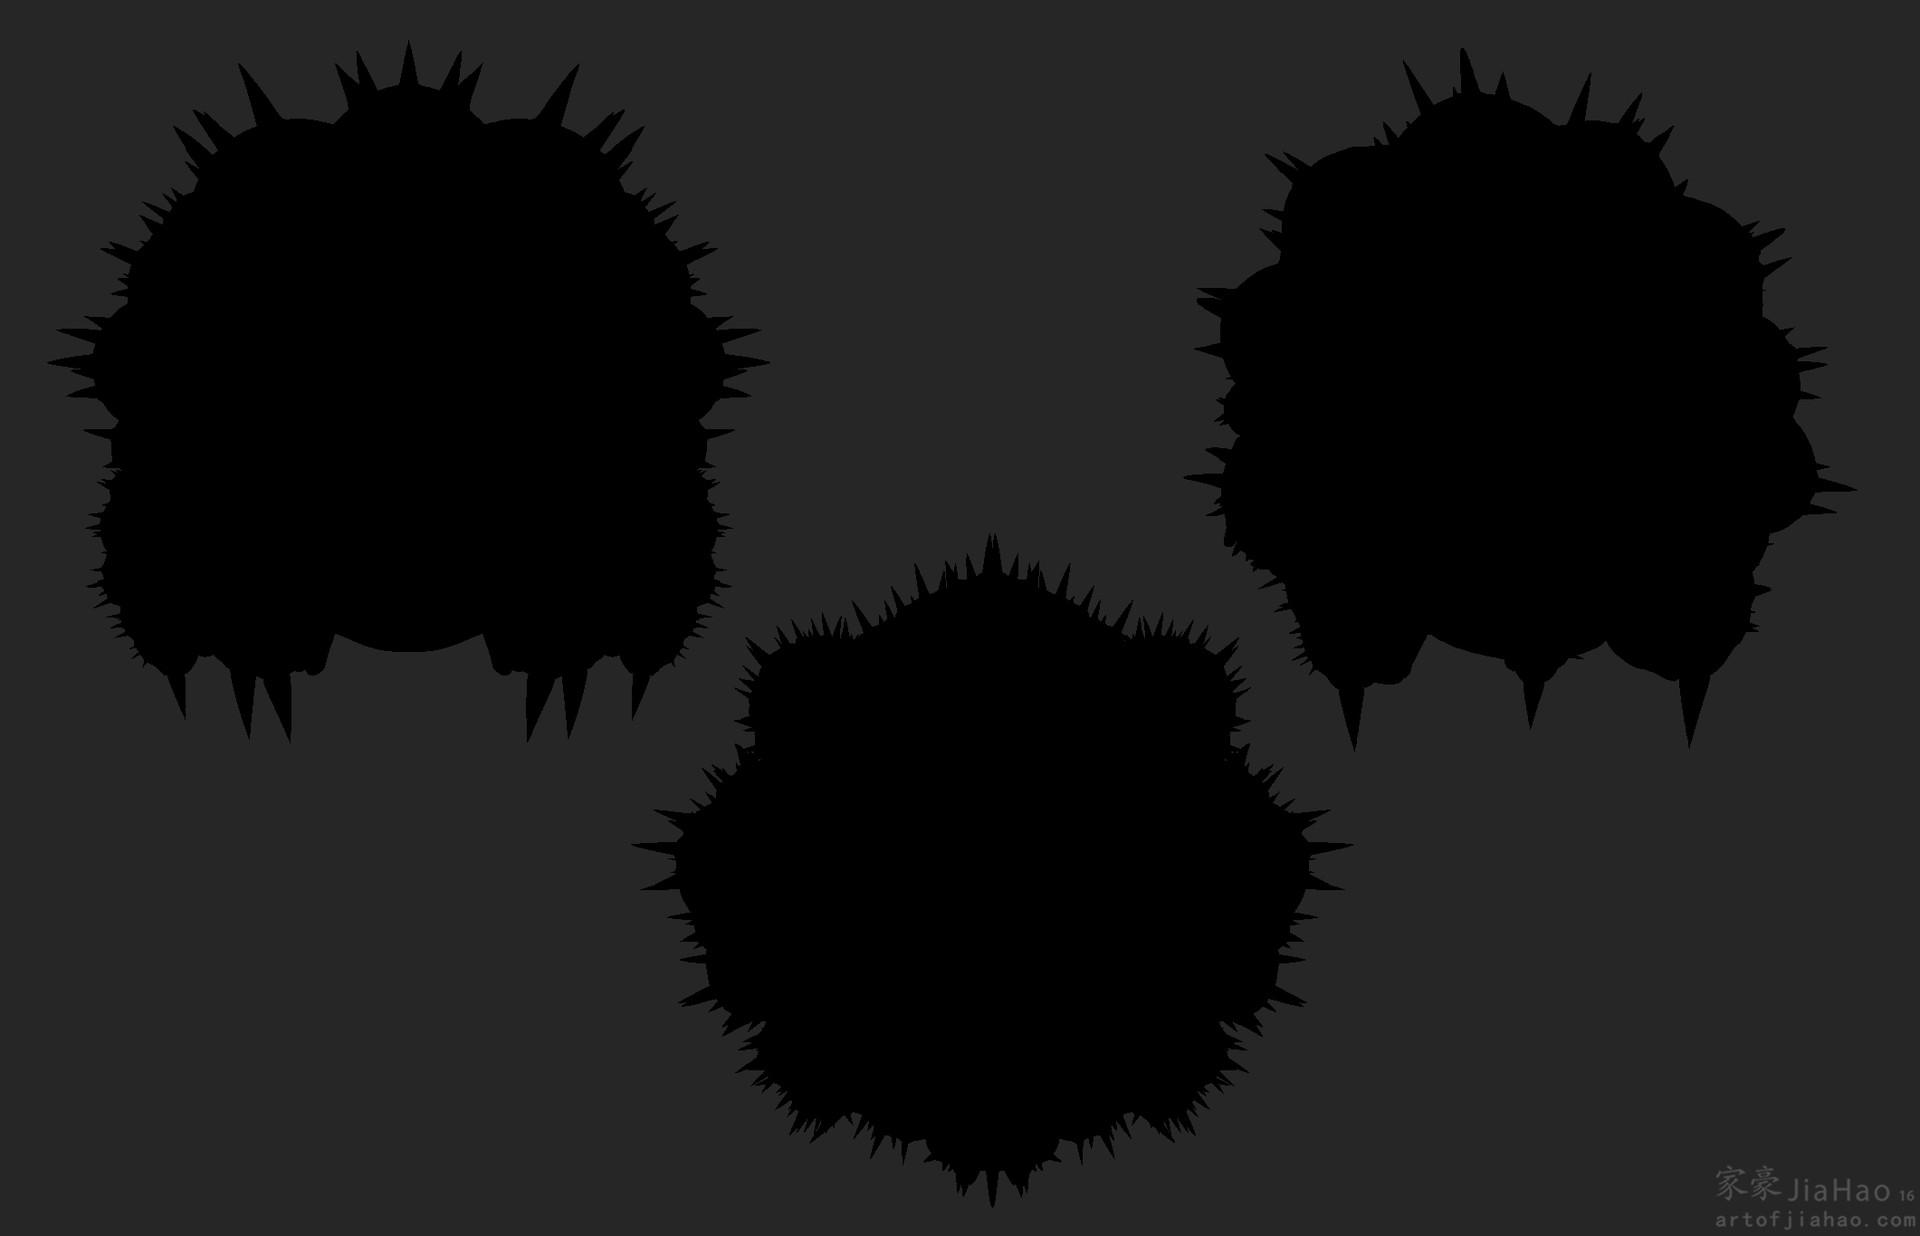 Jia hao 2016 09 spikycrabcreature poseddefensesilouhette